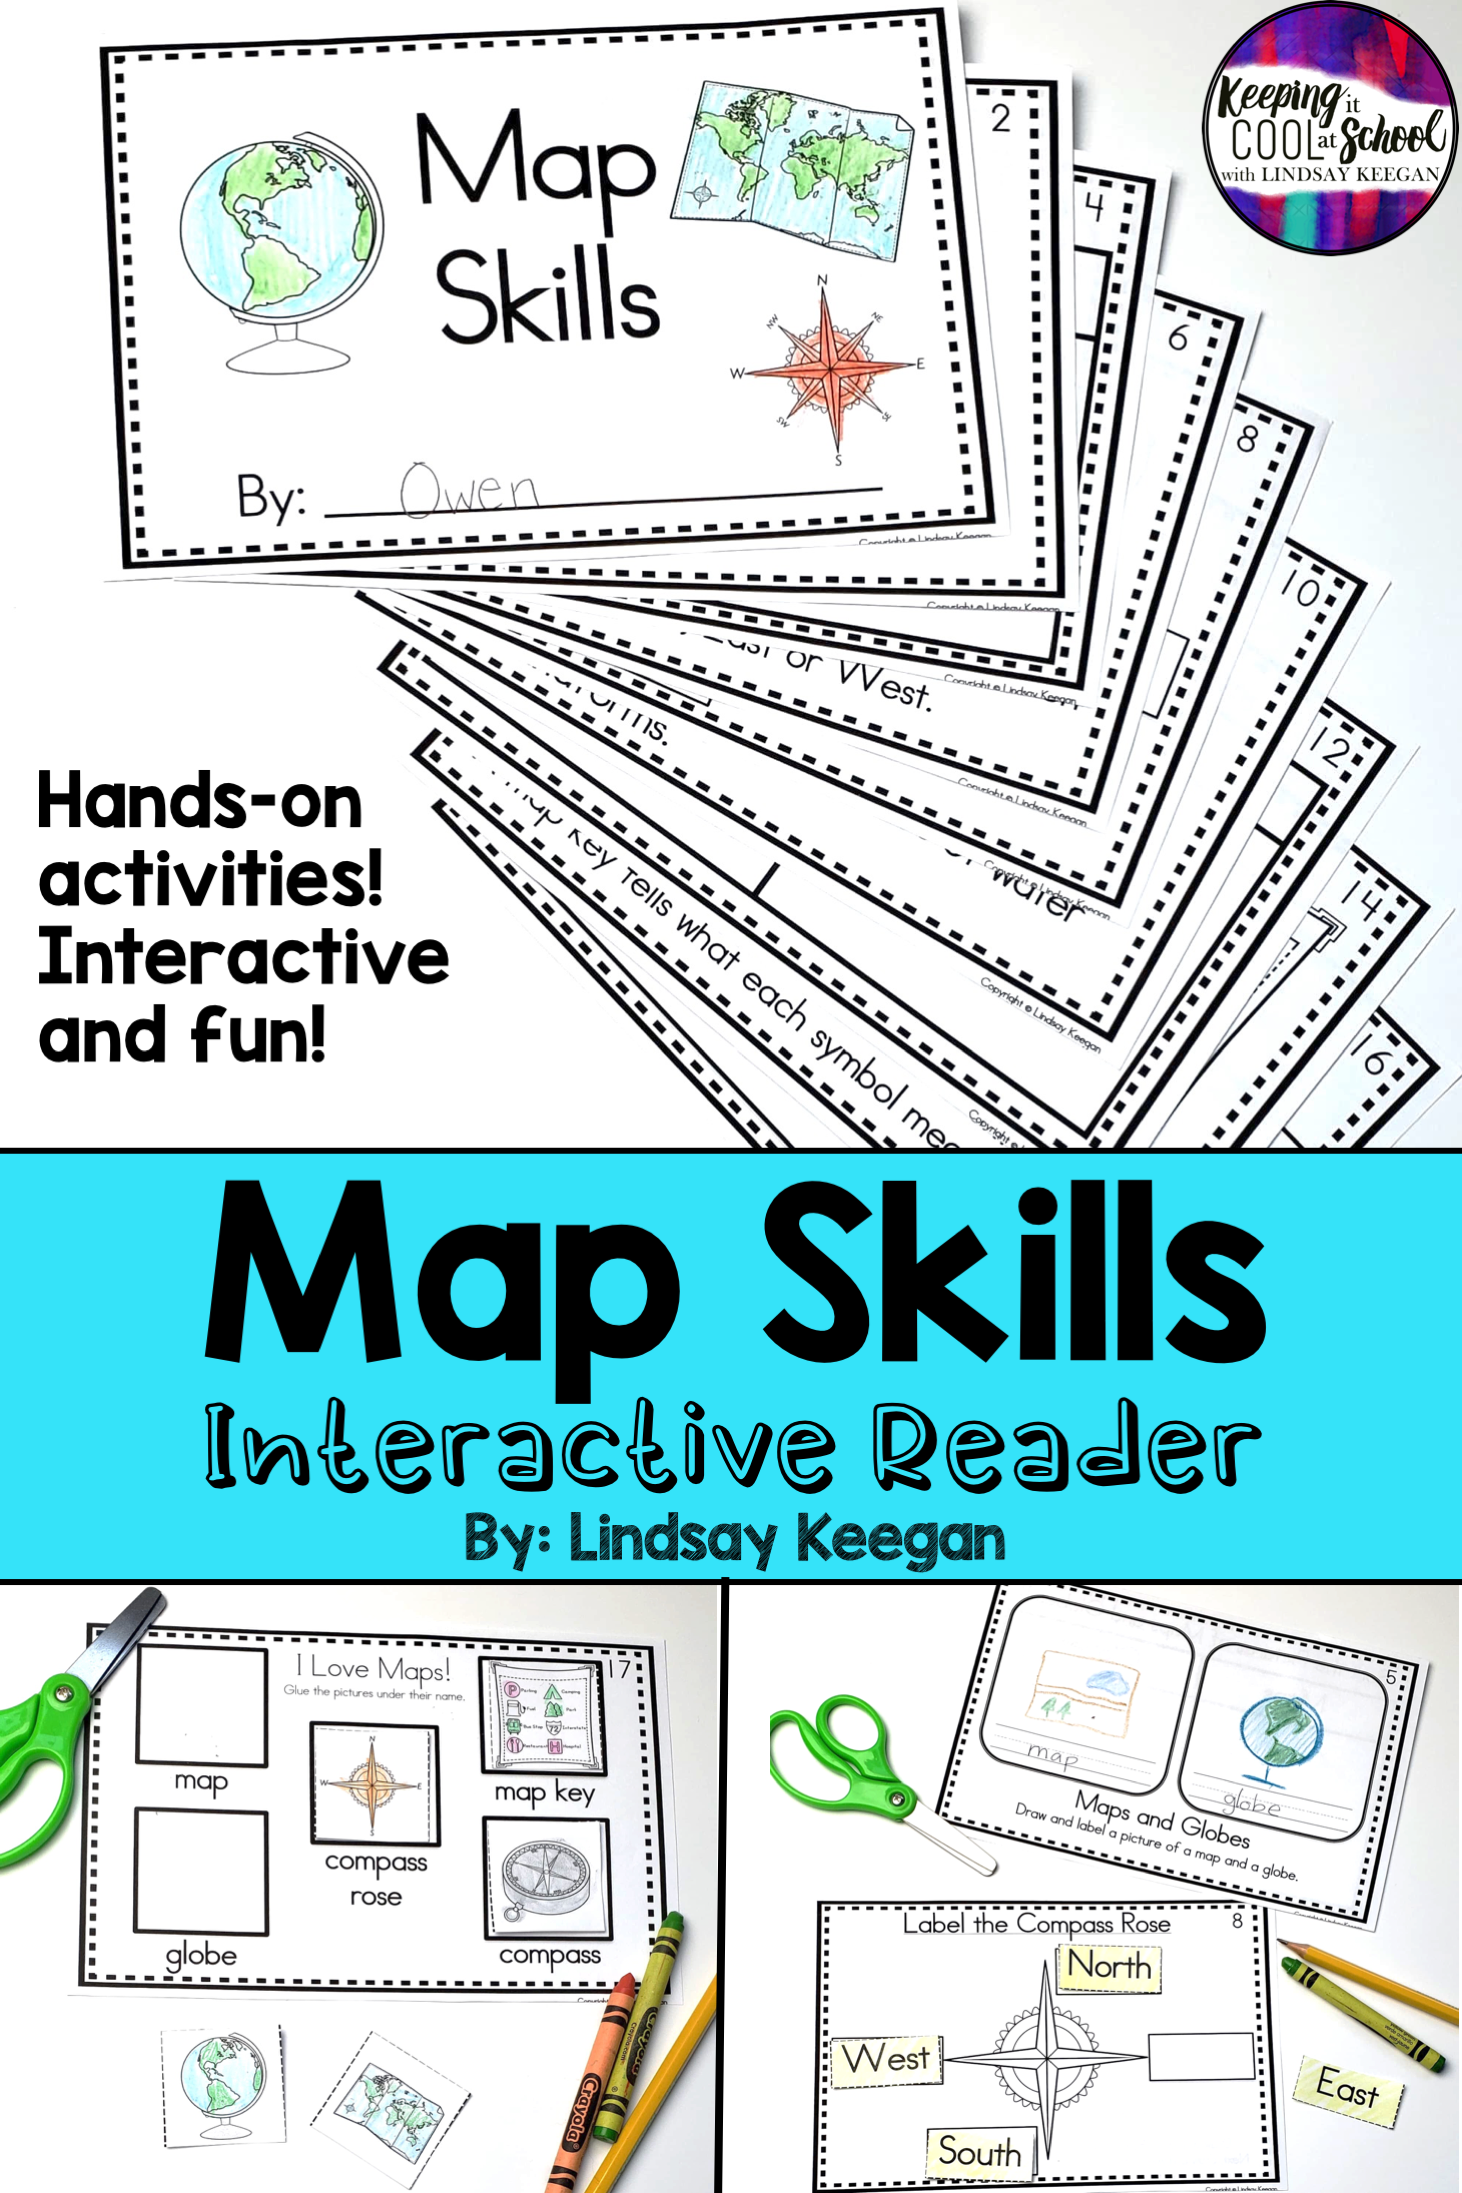 Map Skills Interactive Reader Teaching Map Skills Teaching Maps Map Skills [ 2193 x 1462 Pixel ]